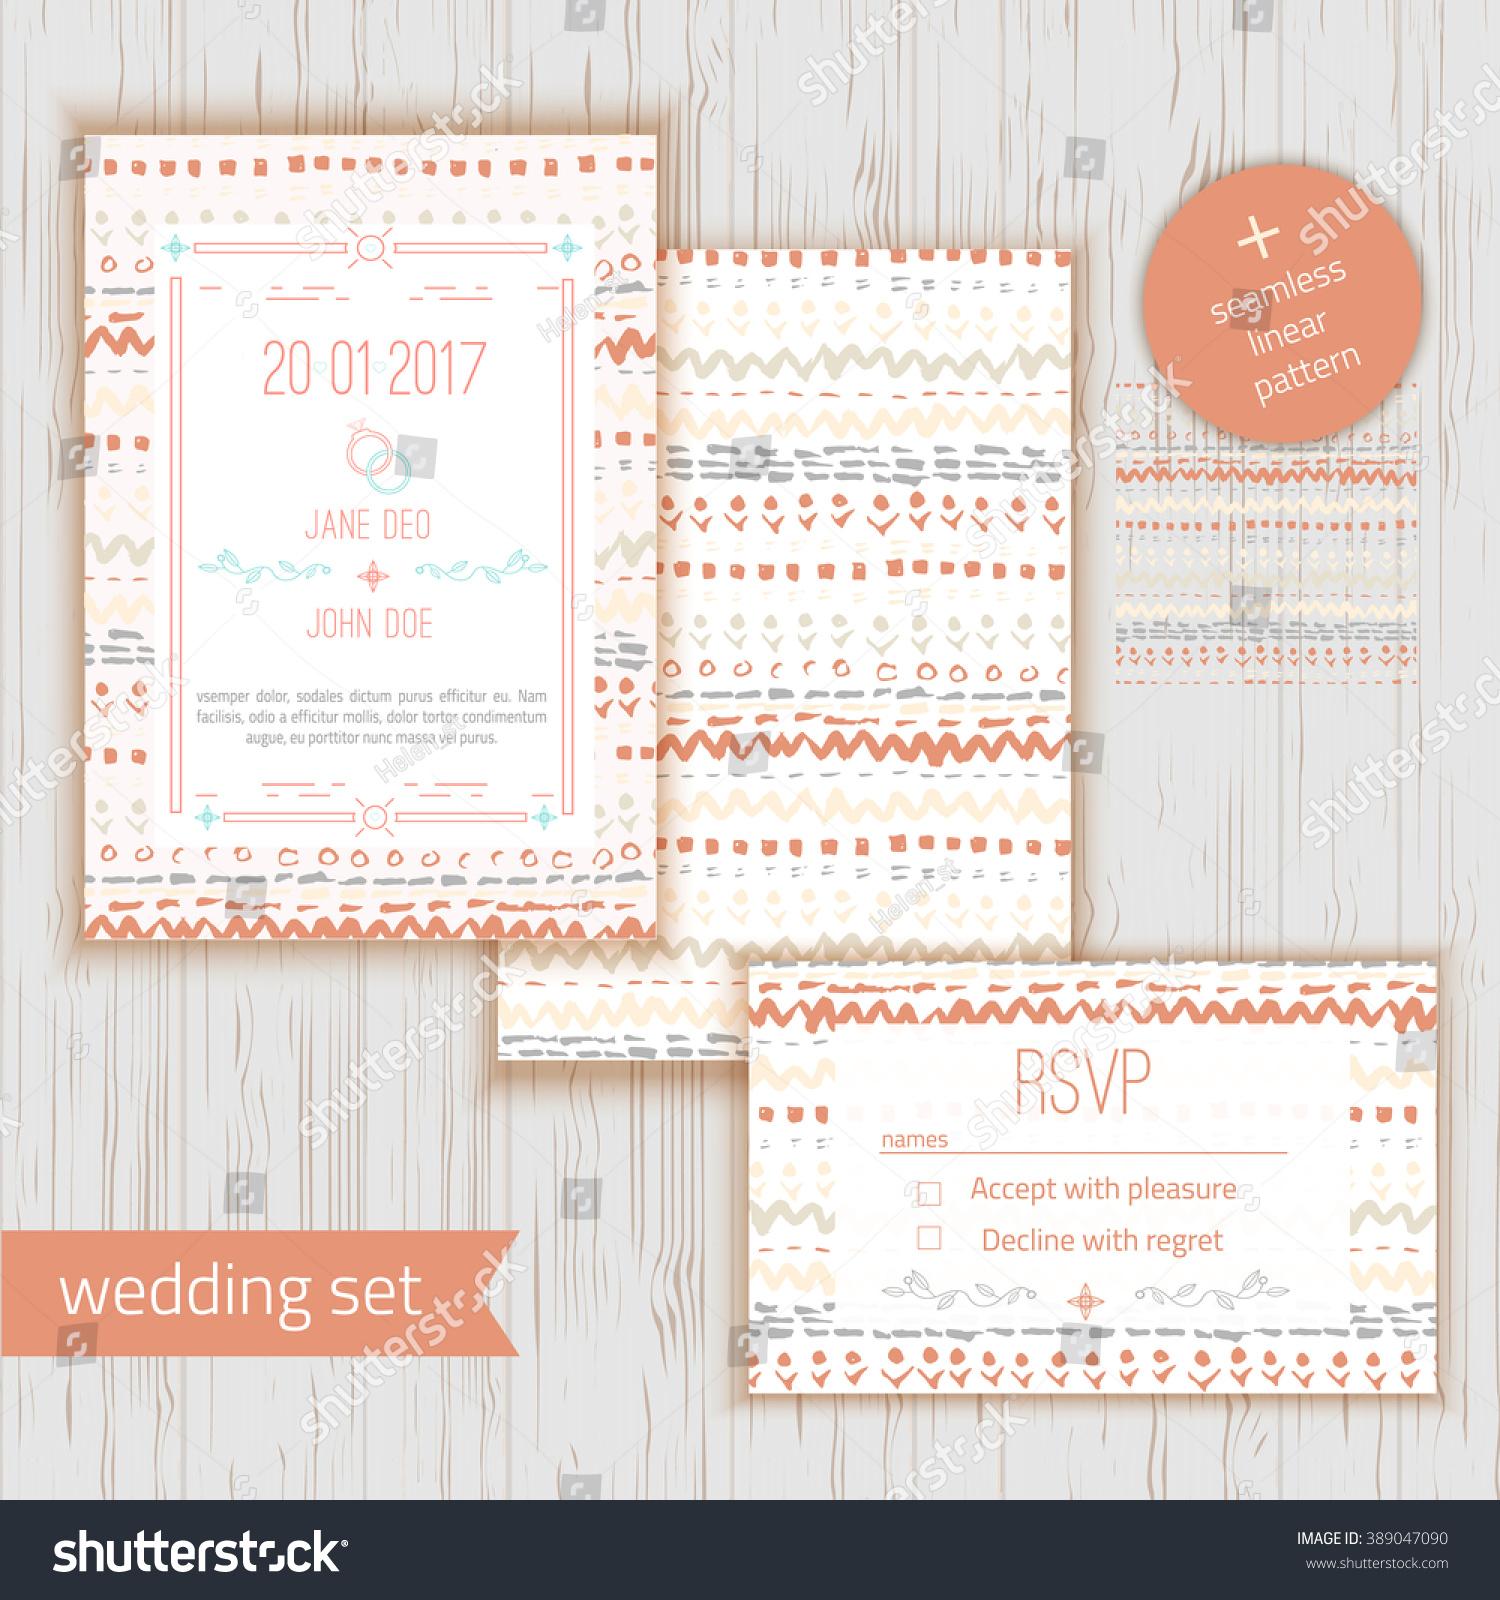 Stylish Rustic Save Date Wedding Invitation Stock Vector 389047090 ...